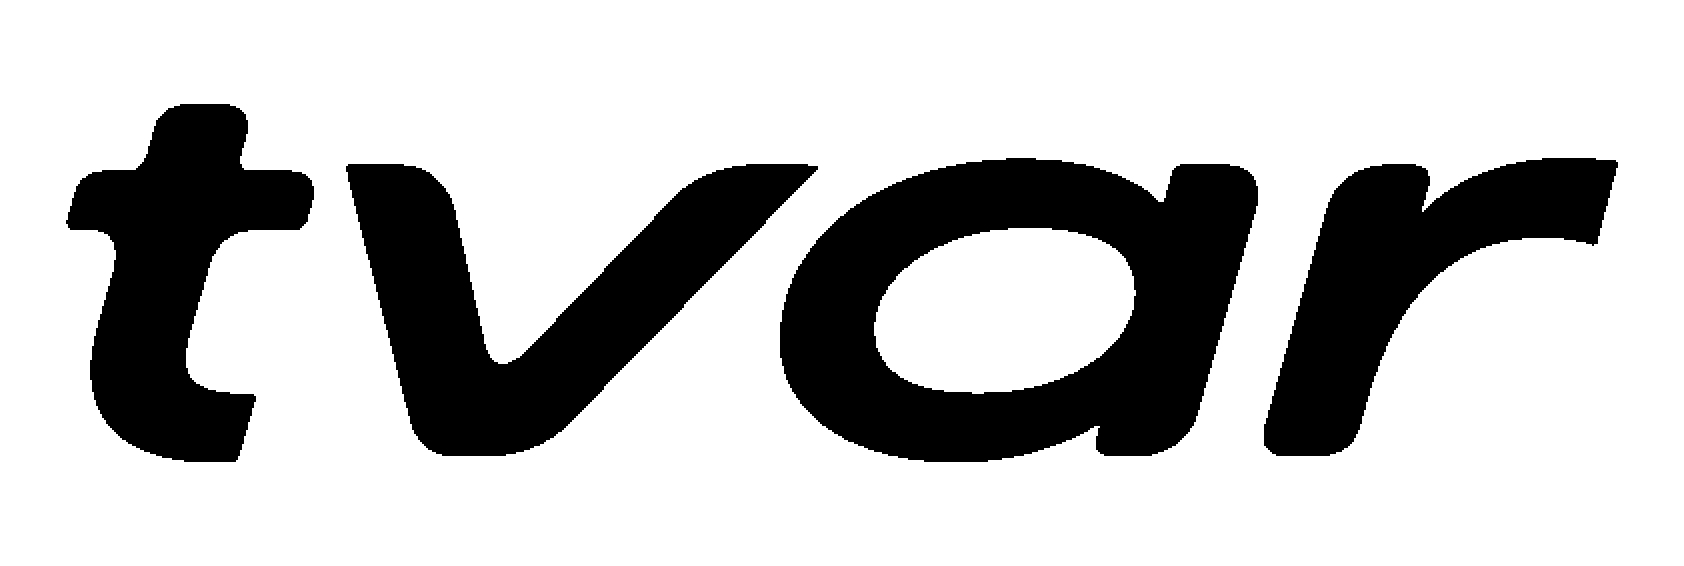 tvar_logo.jpg